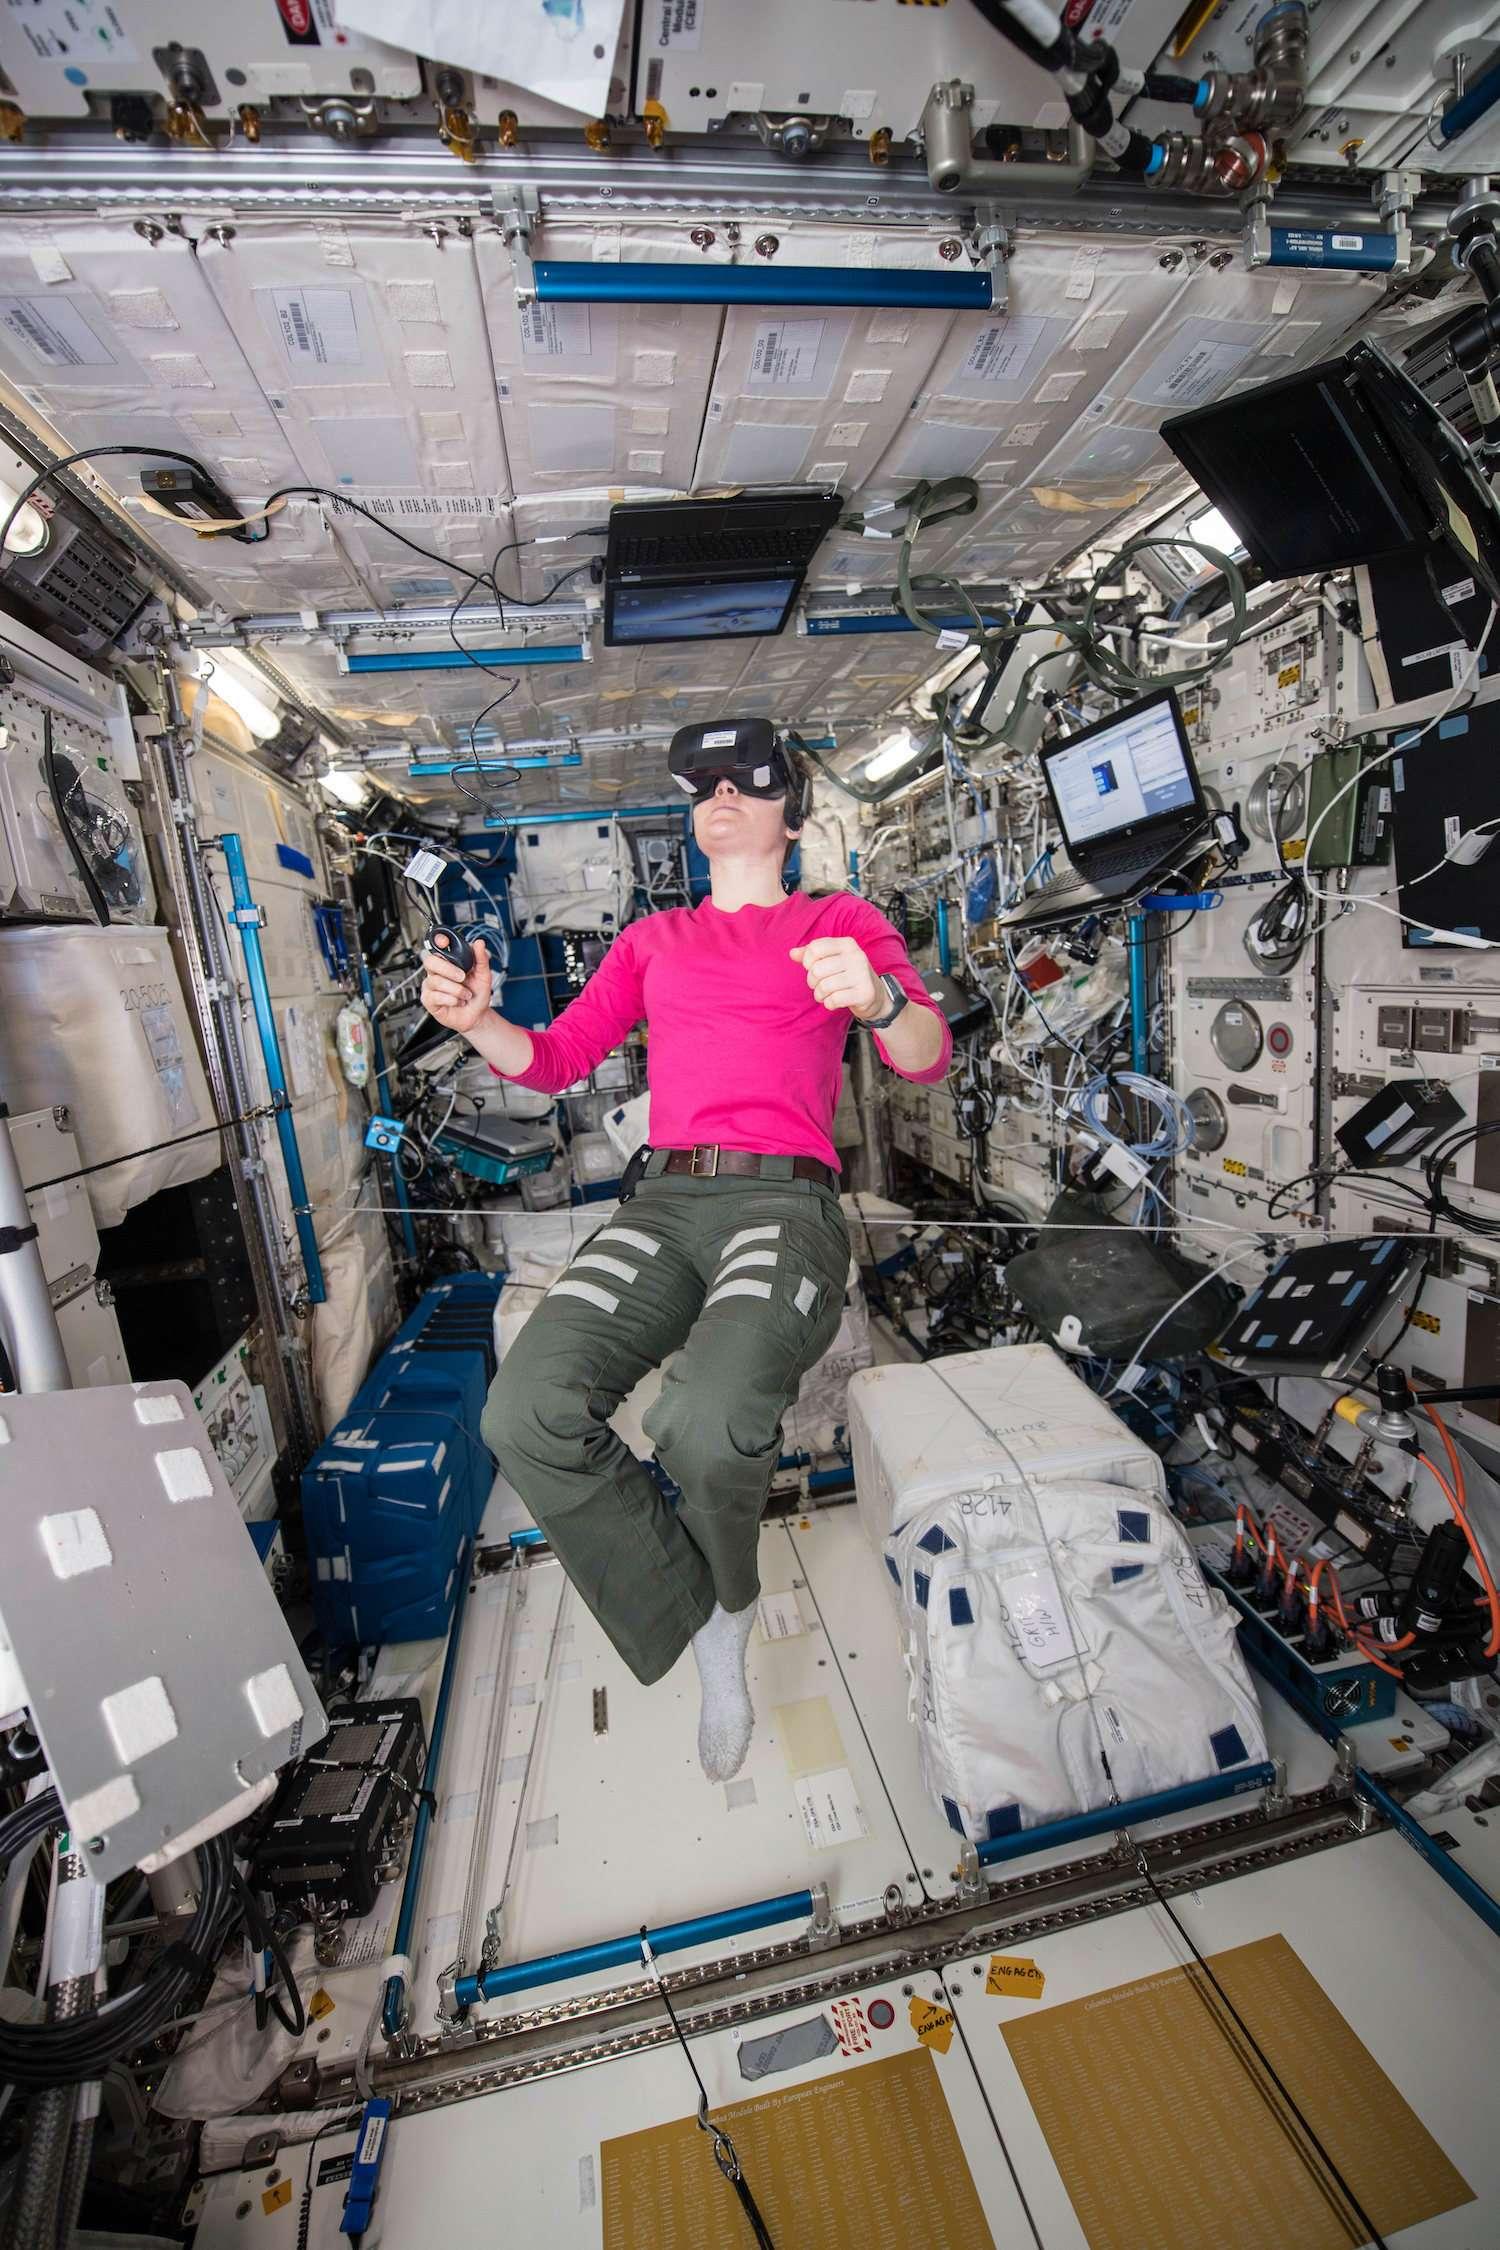 Surprising science careers - space psychologist